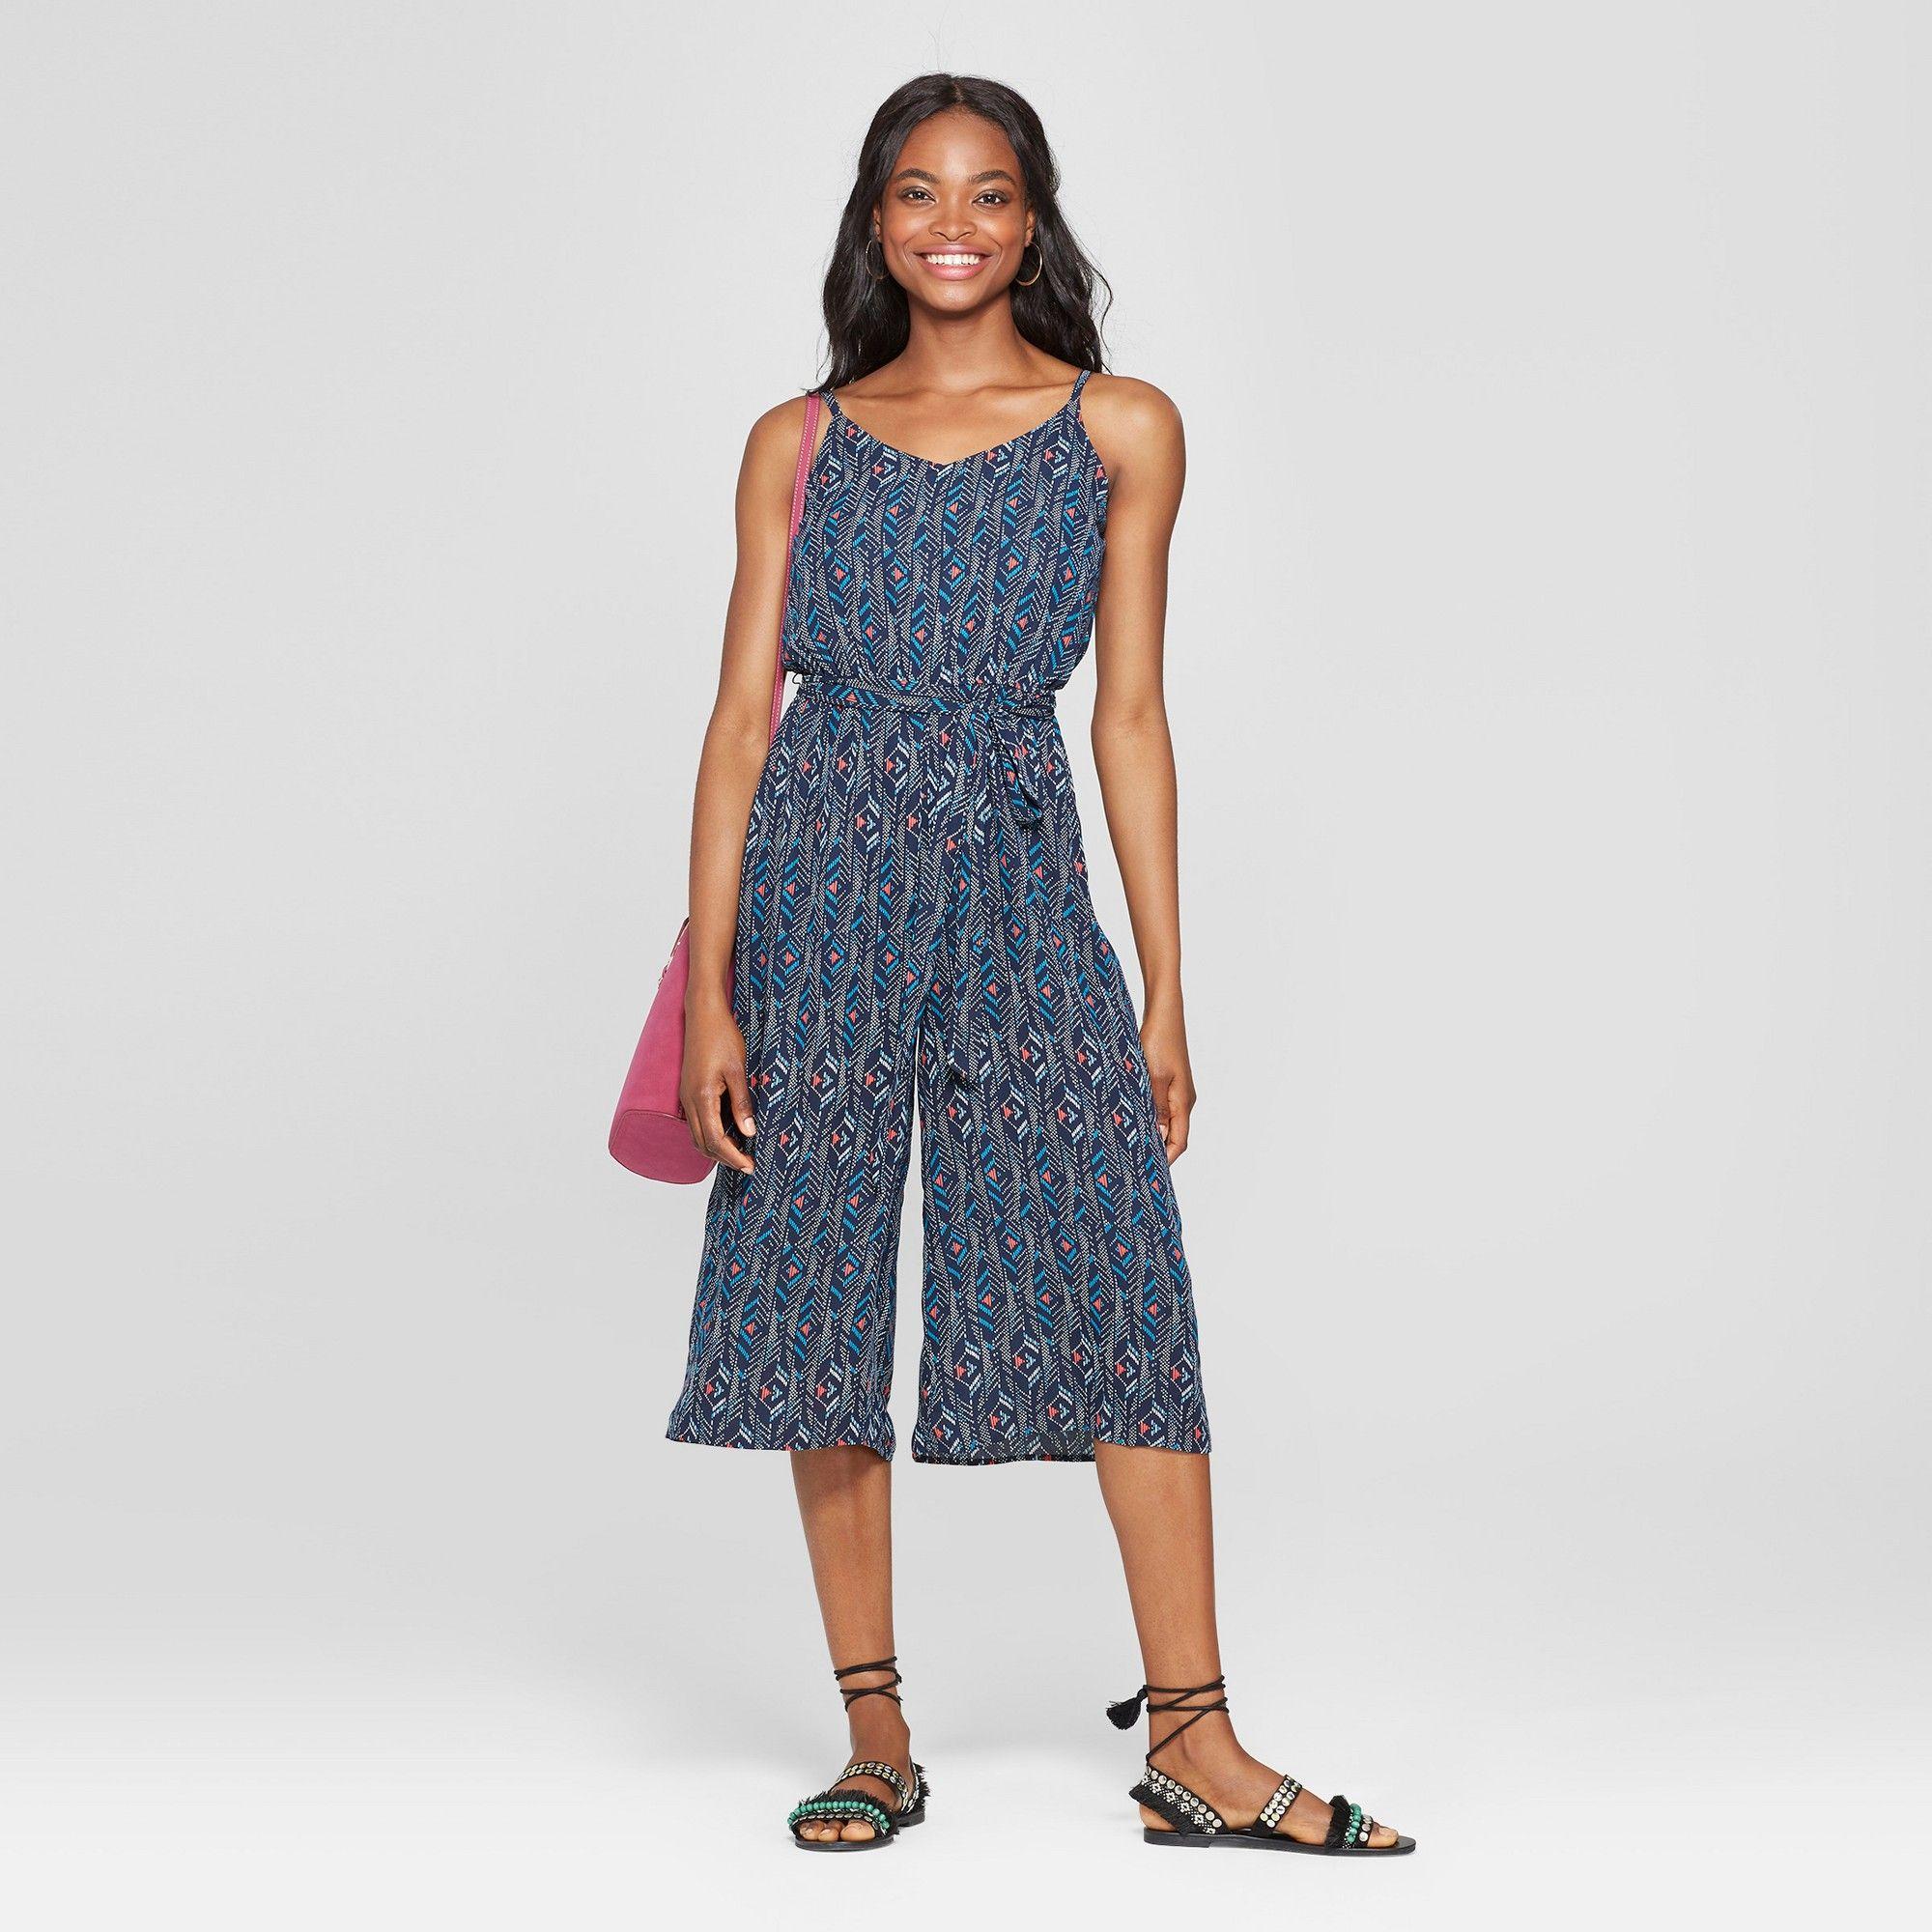 ee0156b8dba0 Women s Tribal Print Sleeveless Tie Waist Jumpsuit - Lily Star (Juniors )  Navy S